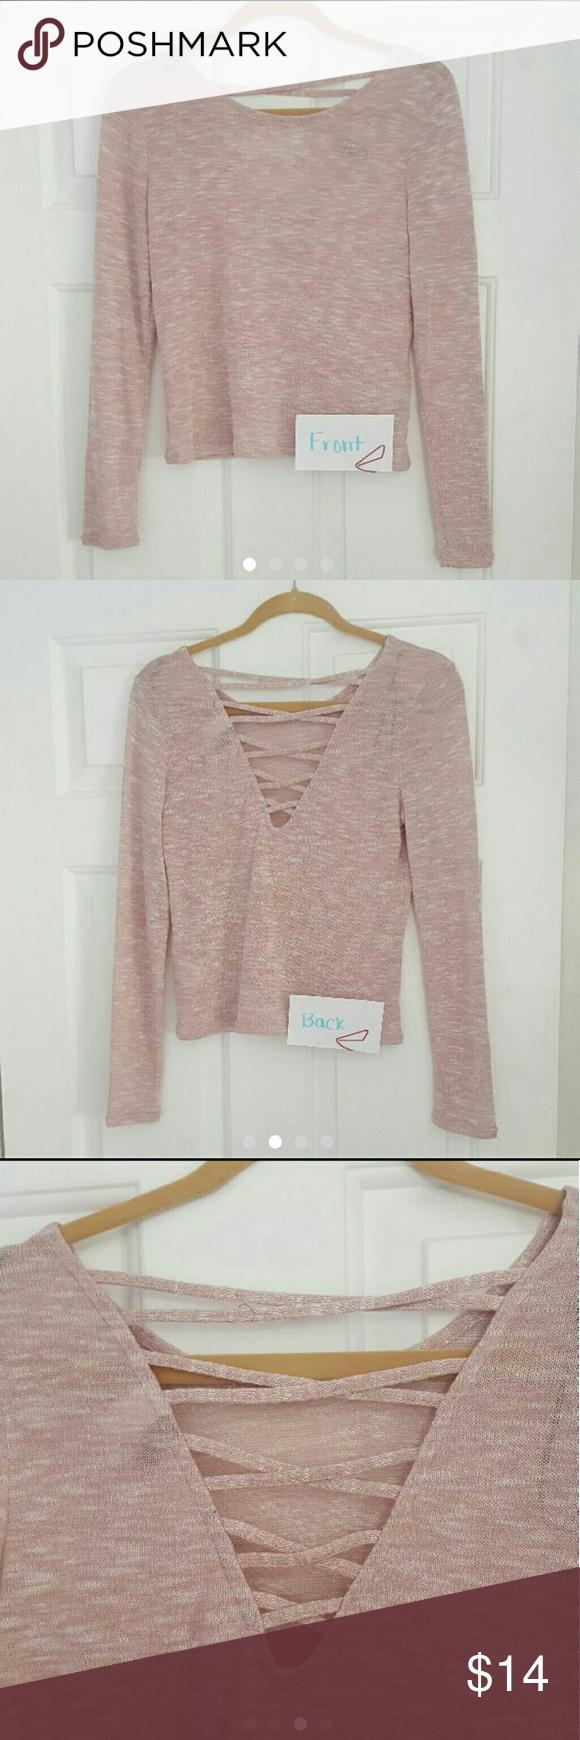 H&M strappy back crop top Light pink/blush Size medium Never worn H&M Tops Crop Tops